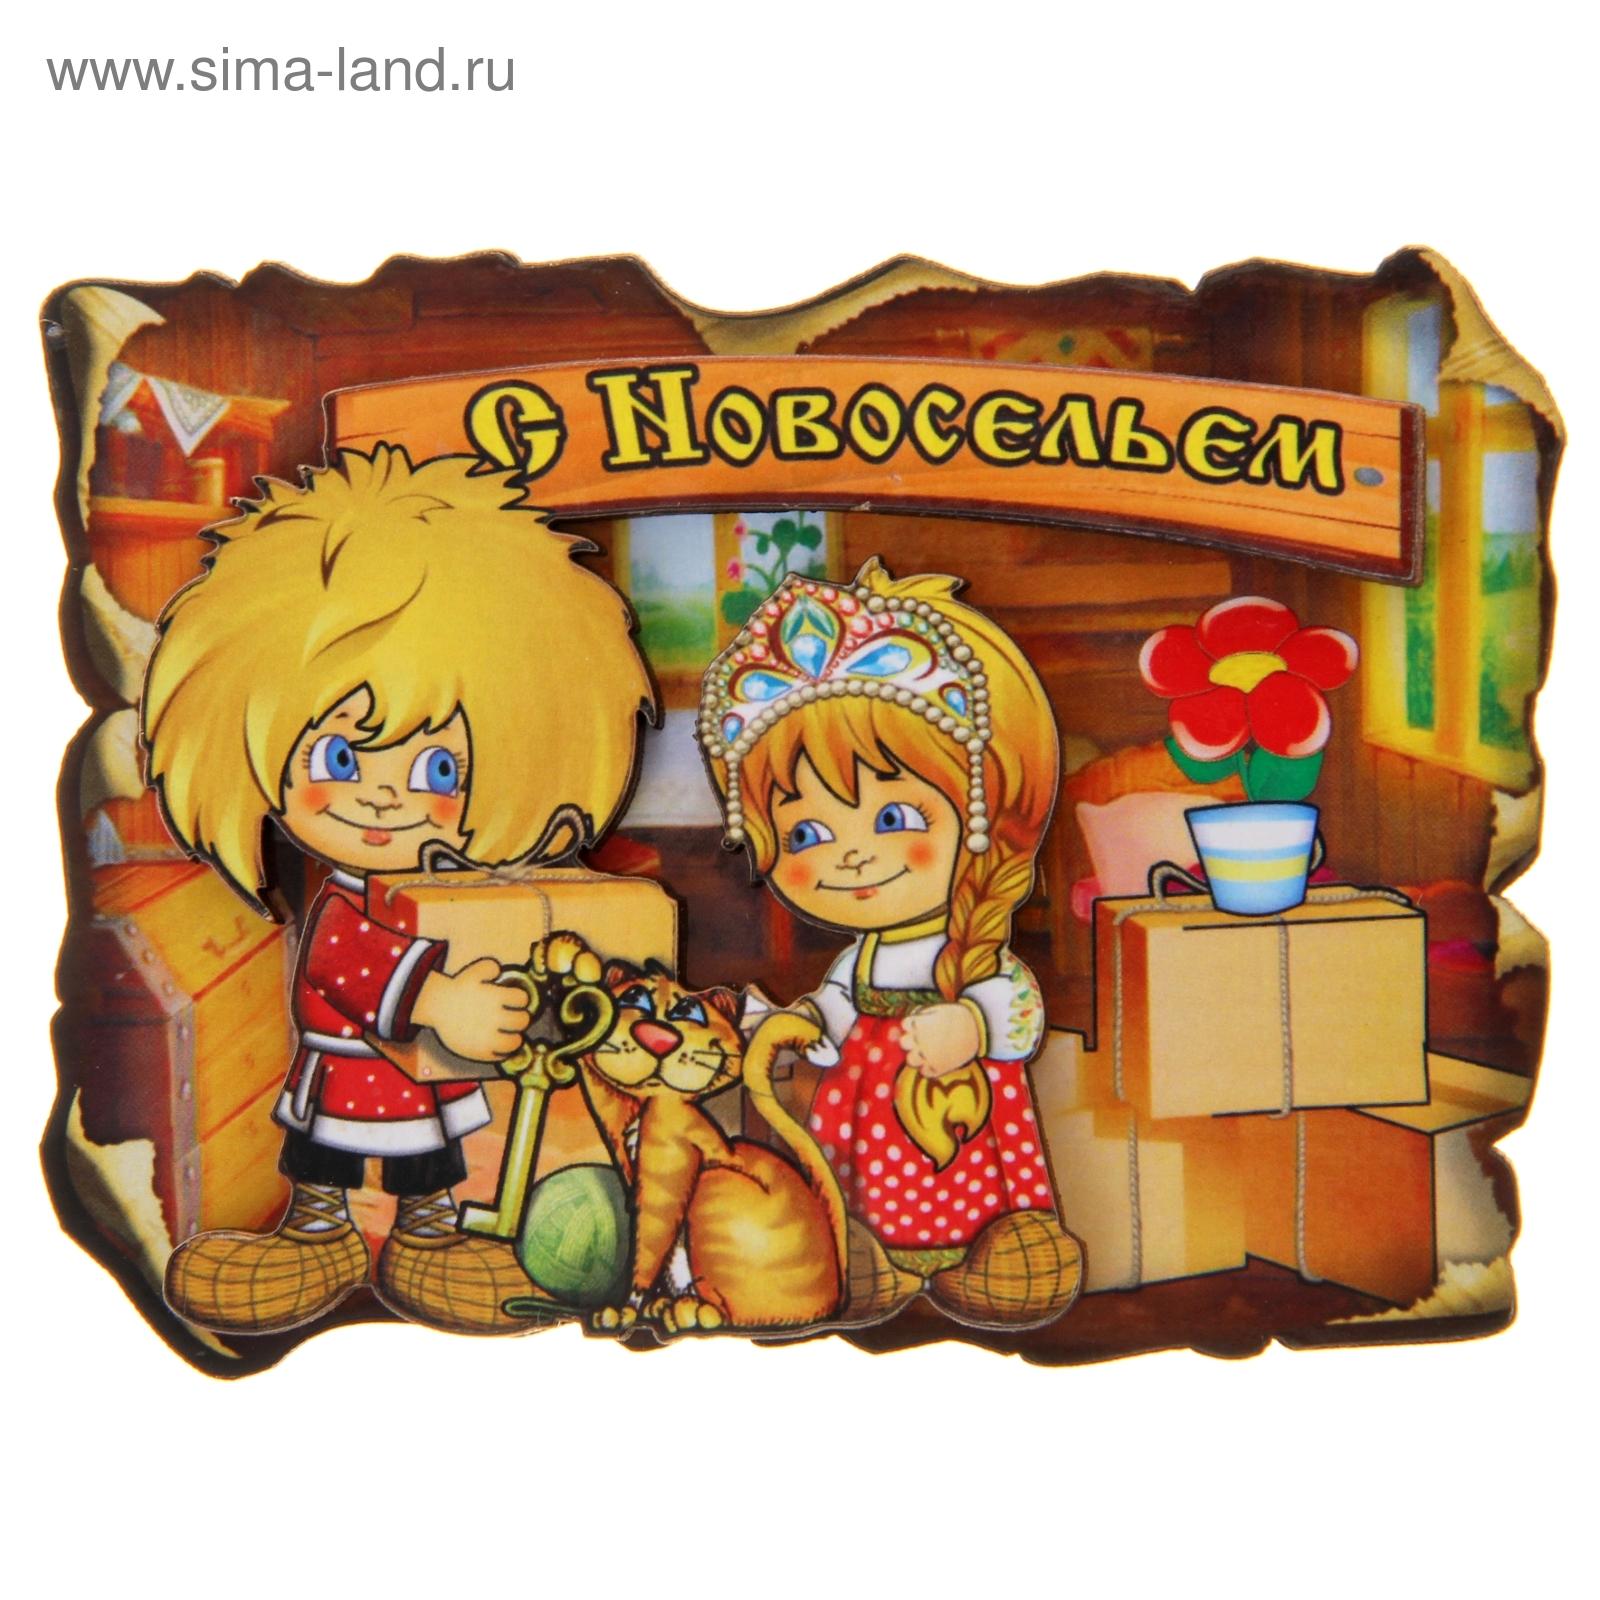 http://sa.uploads.ru/rTLjW.jpg